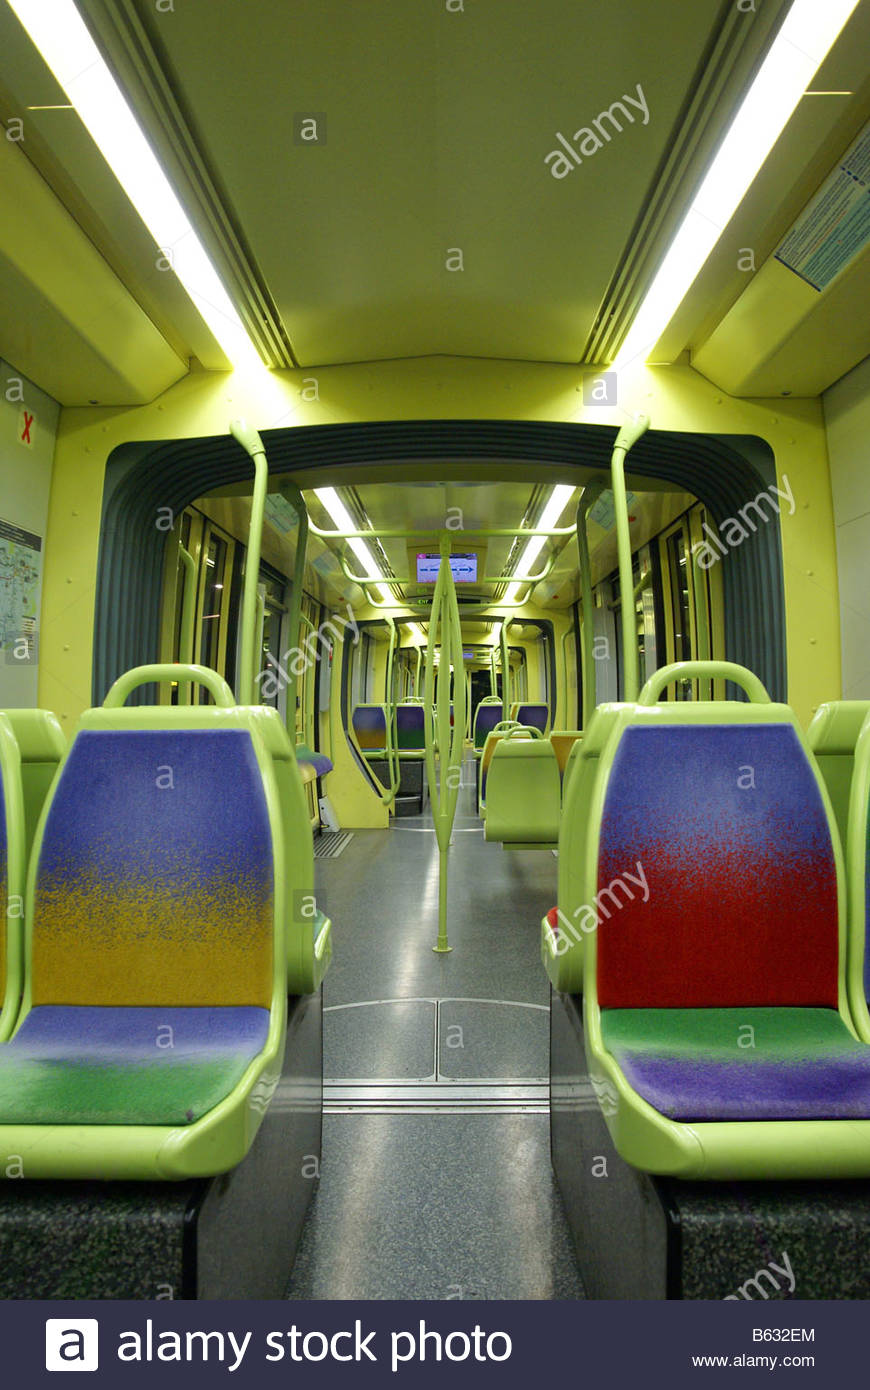 Public transportation : Taking the tramway at night - Stock Image